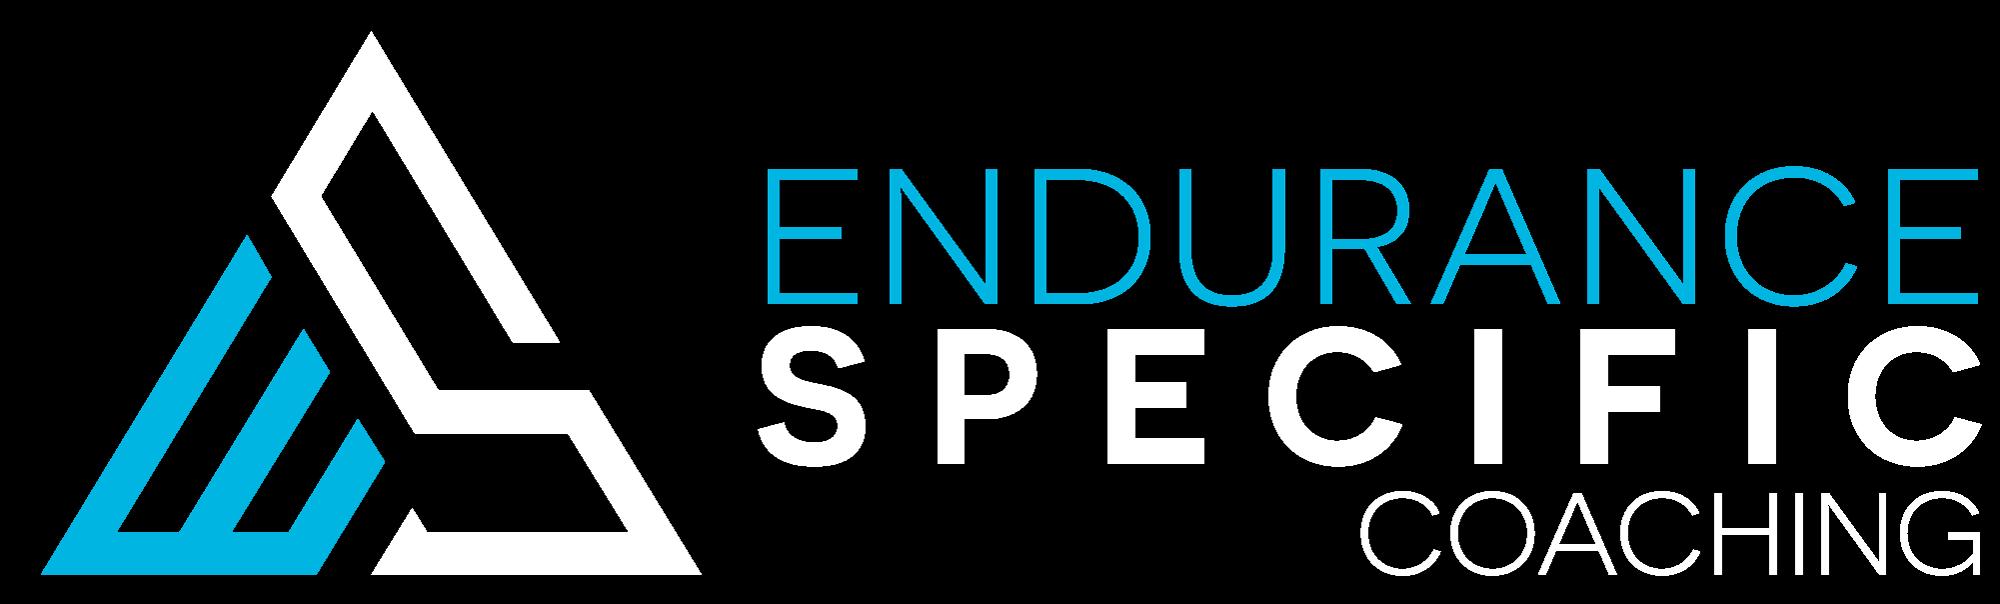 EnduranceSpecific_Logo_HORIZ_WHITEBLUE_WEB_2000px